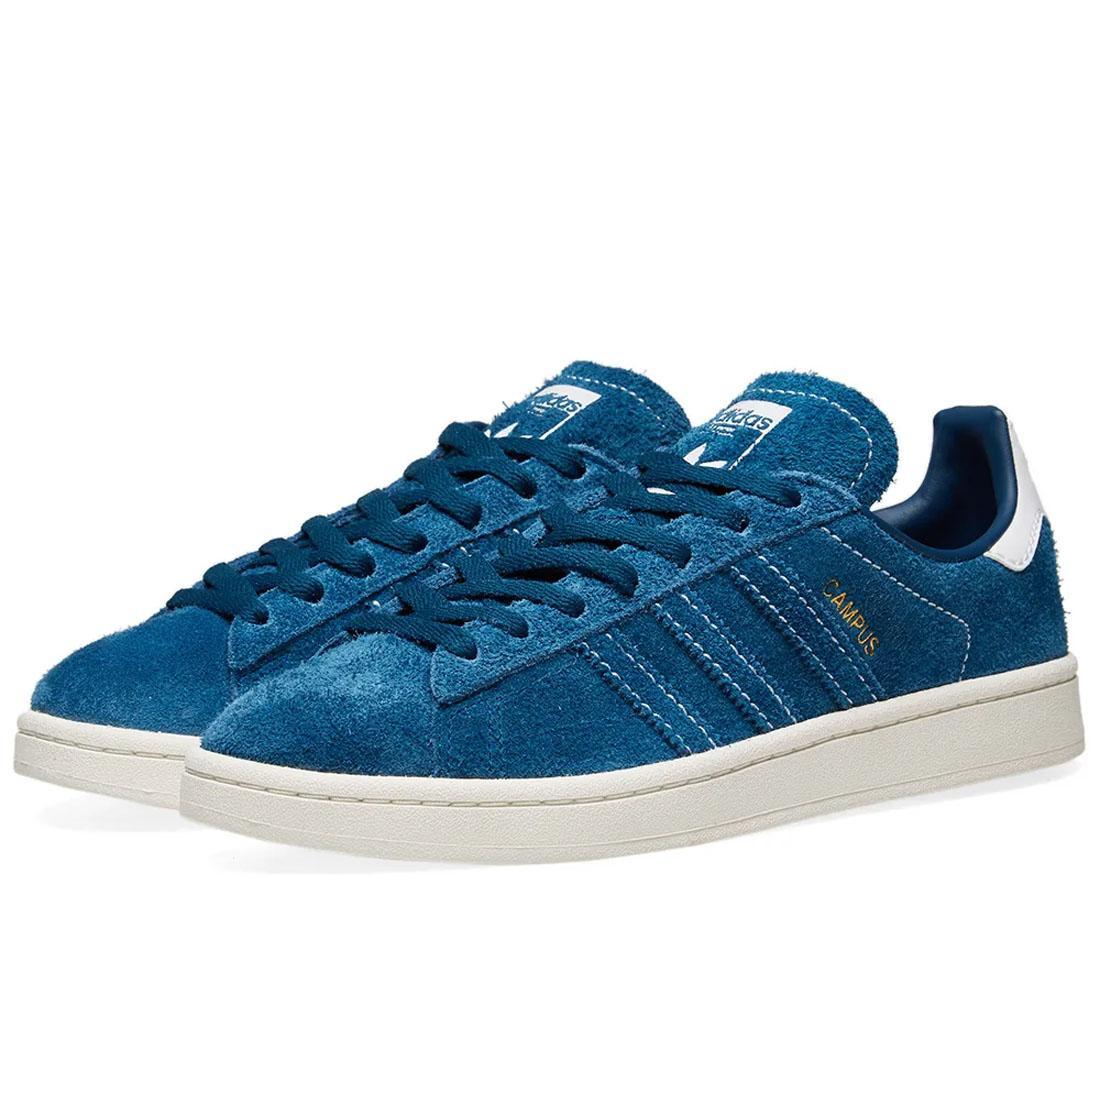 Details about adidas originals Campus Trainers Retro Dark Blue Suede Mens Sports Shoes B37834